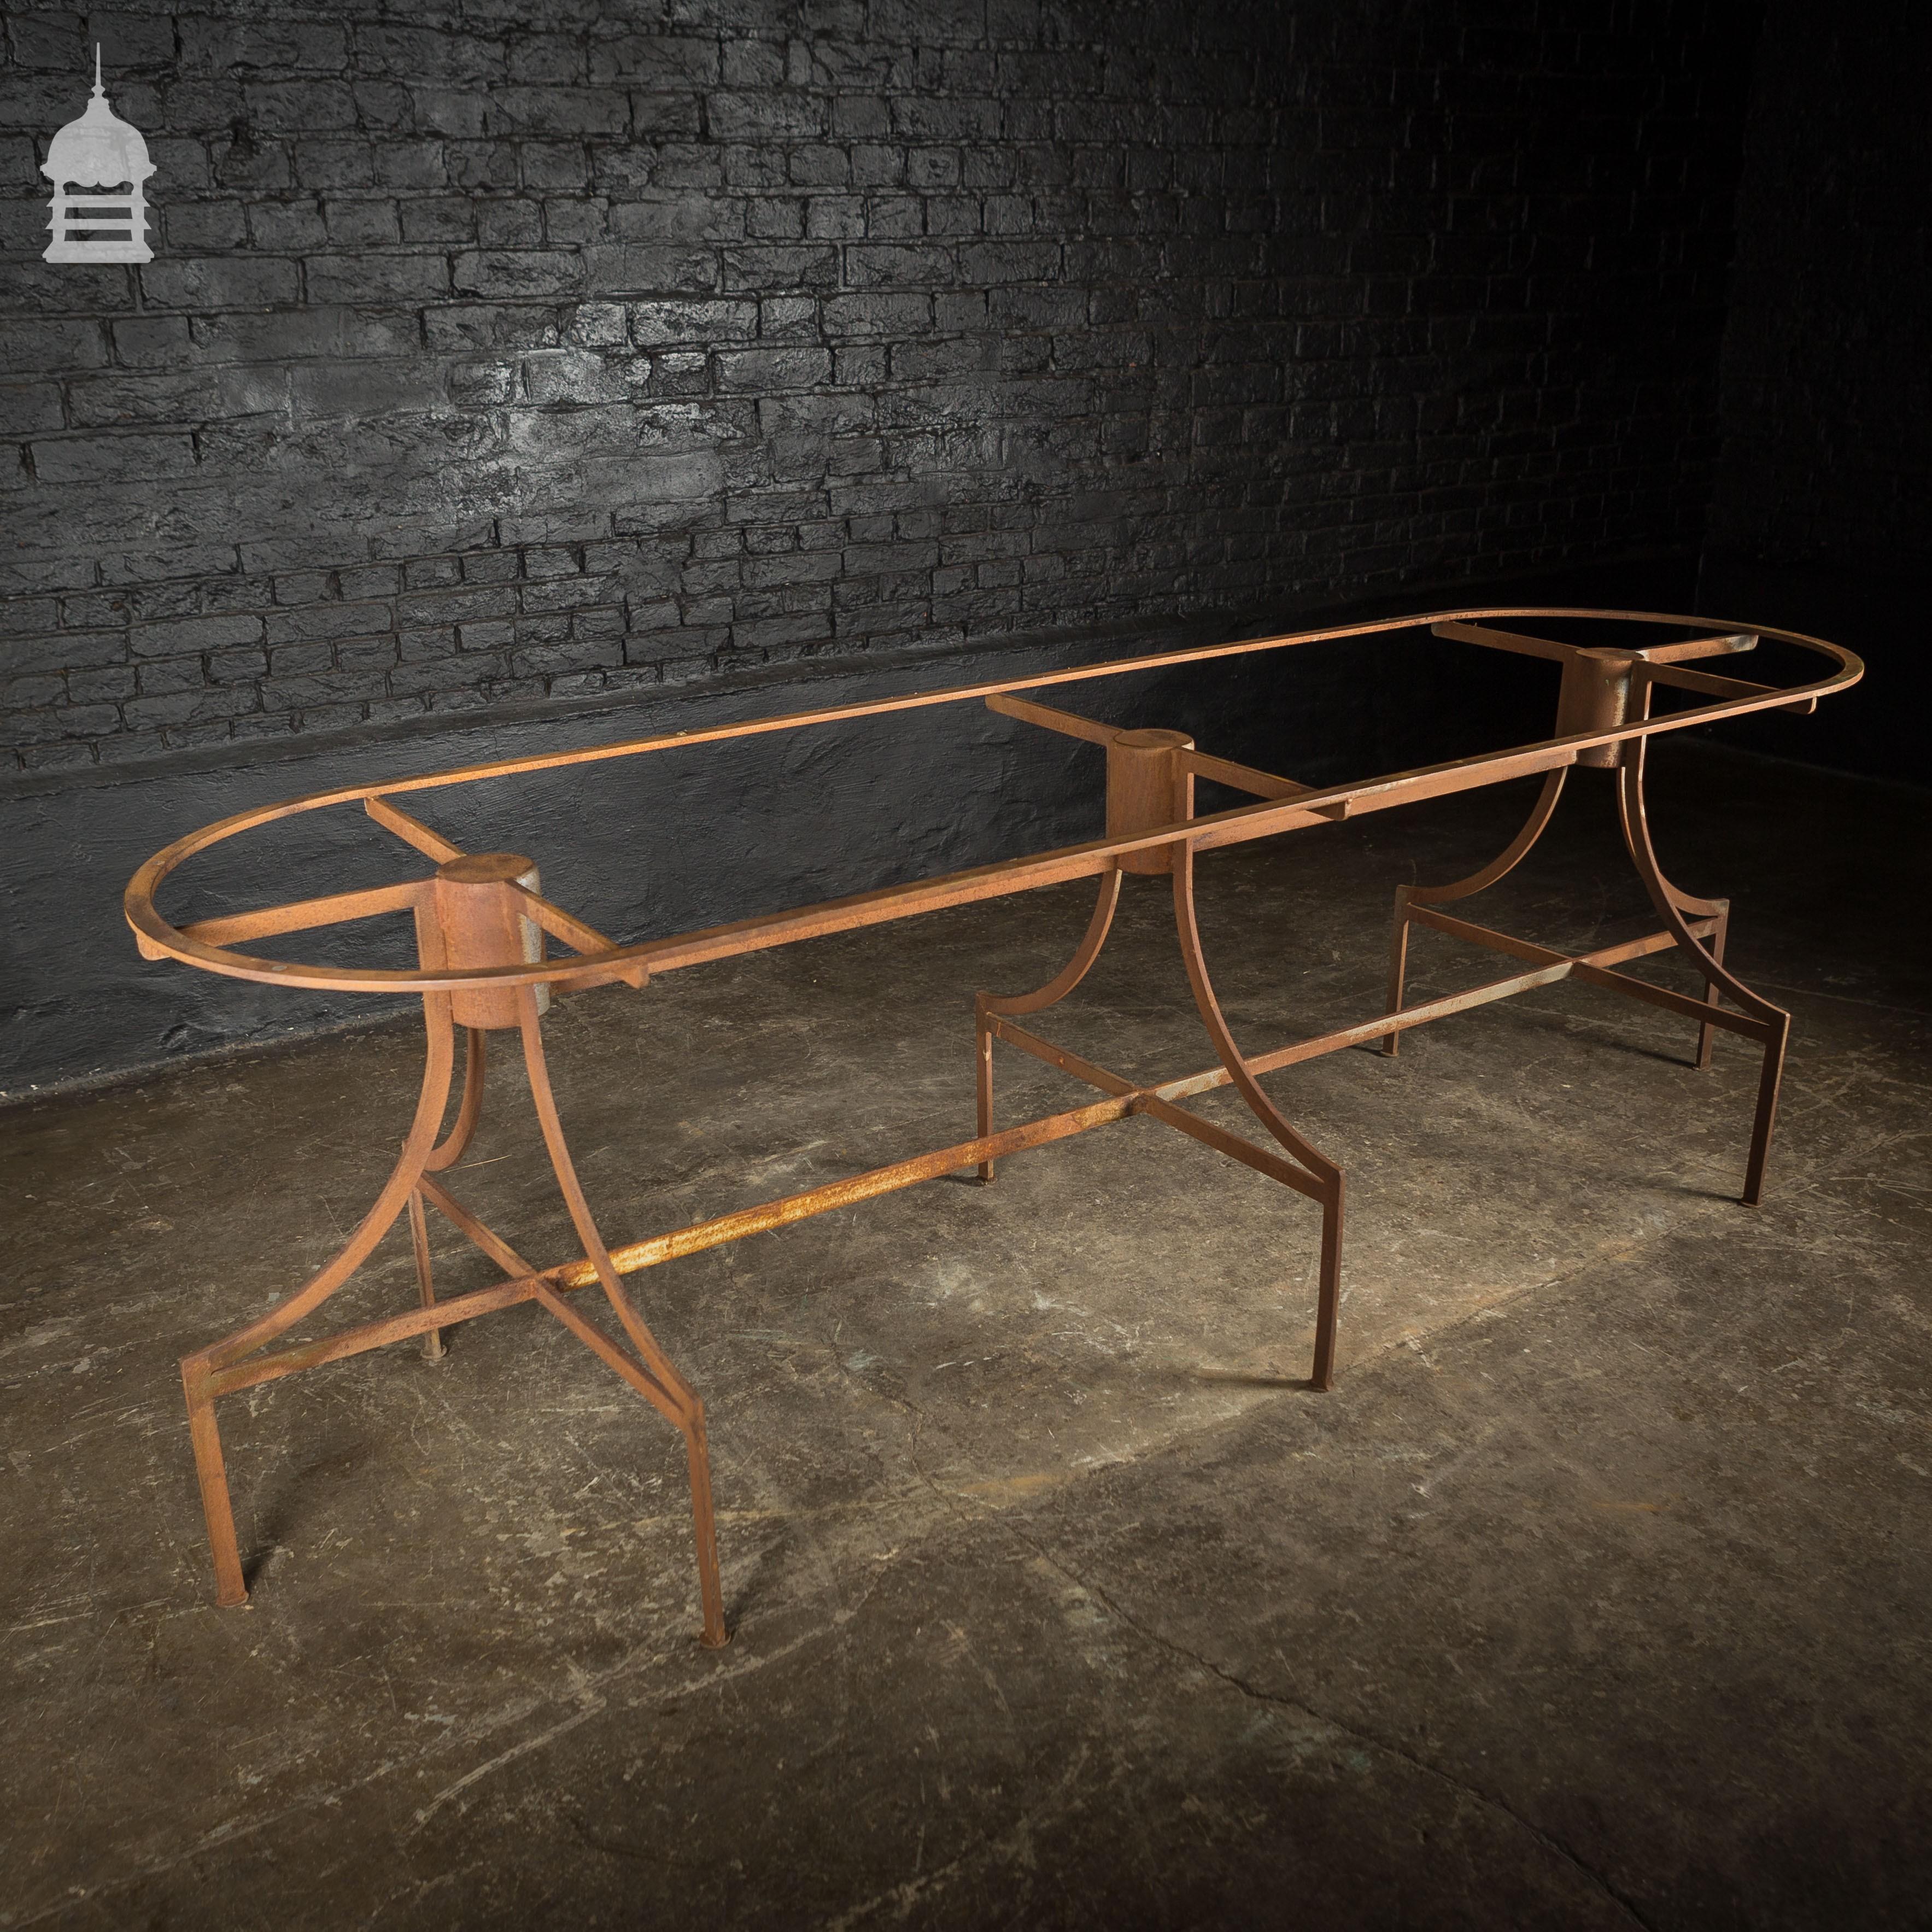 Vintage Bespoke Steel Industrial Table Base - Garden Furniture